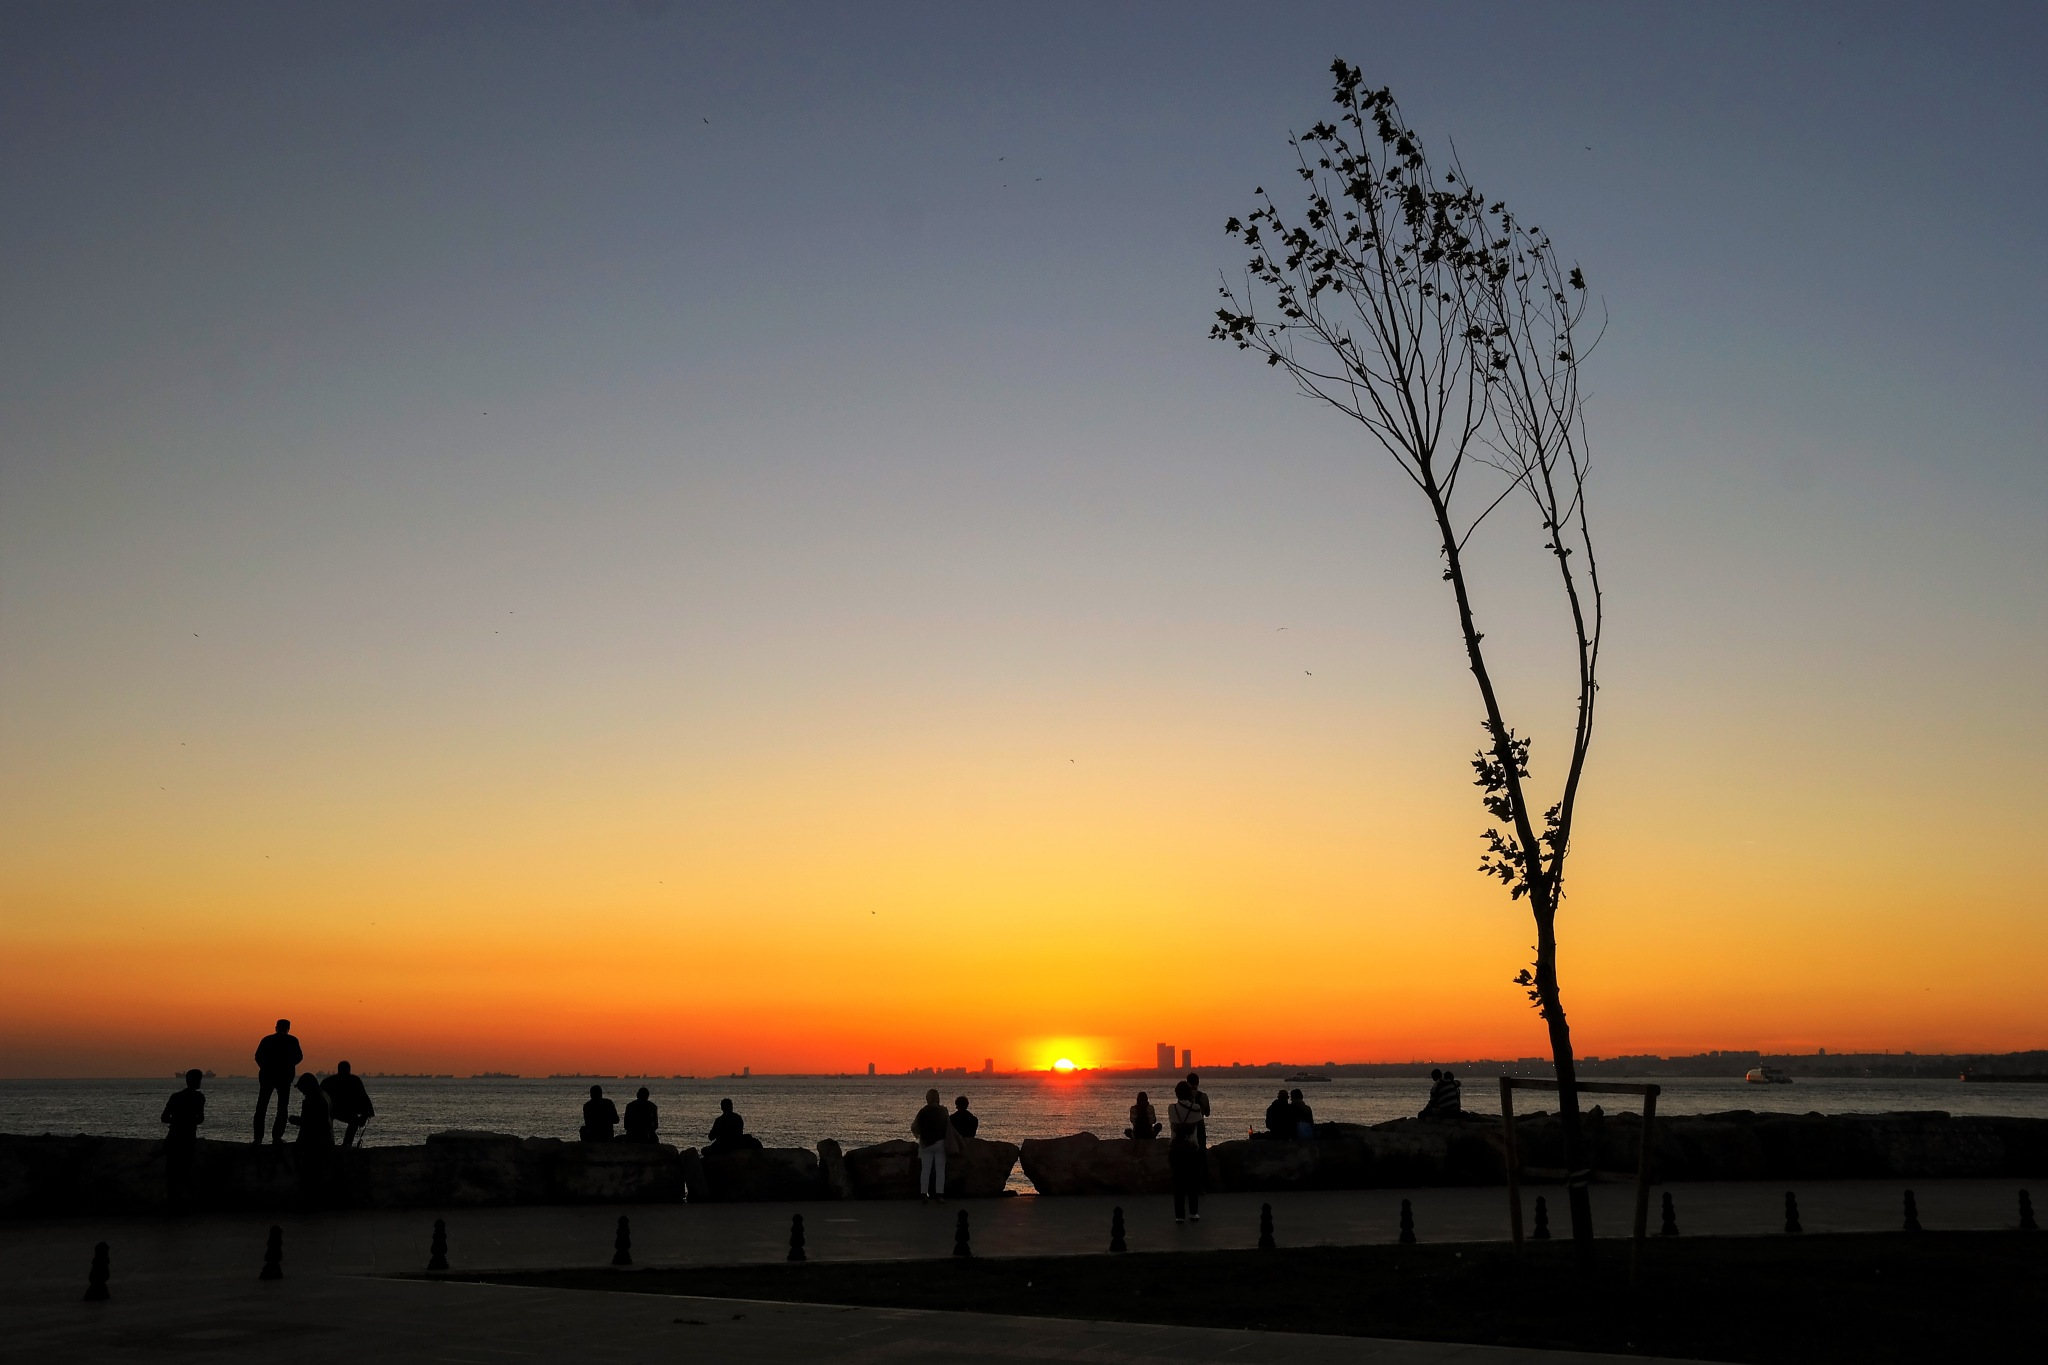 the tree by the sea-2 by Muhsin Özcan